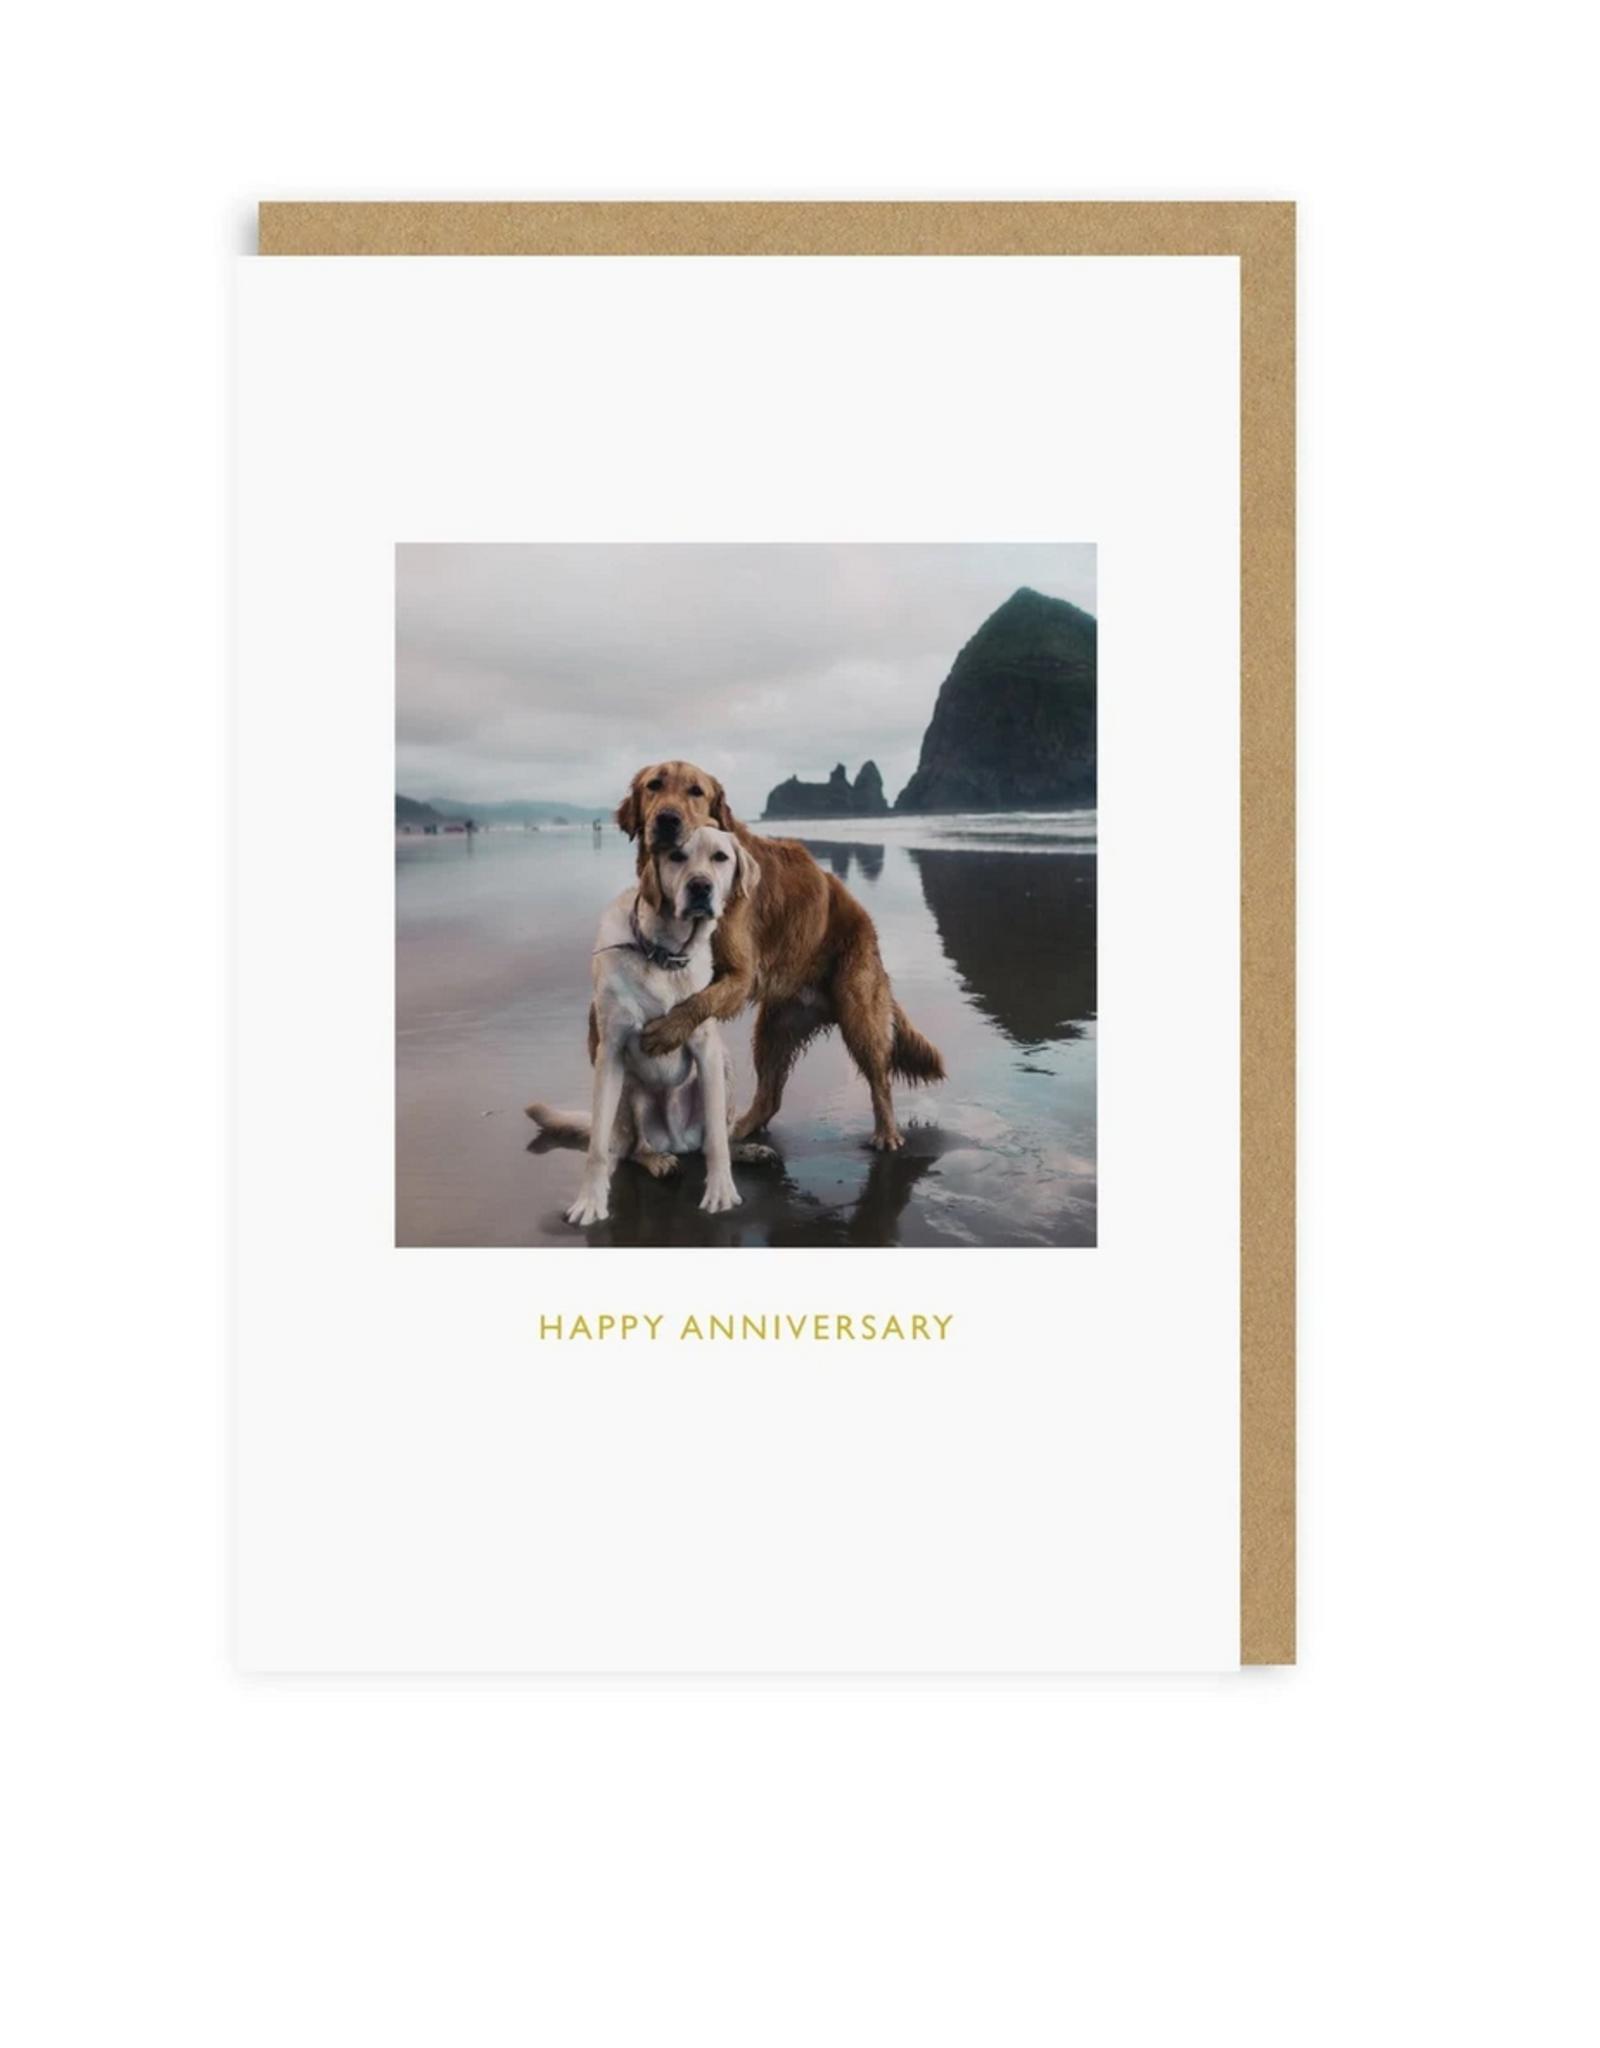 Happy Anniversary Beach Dogs Greeting Card